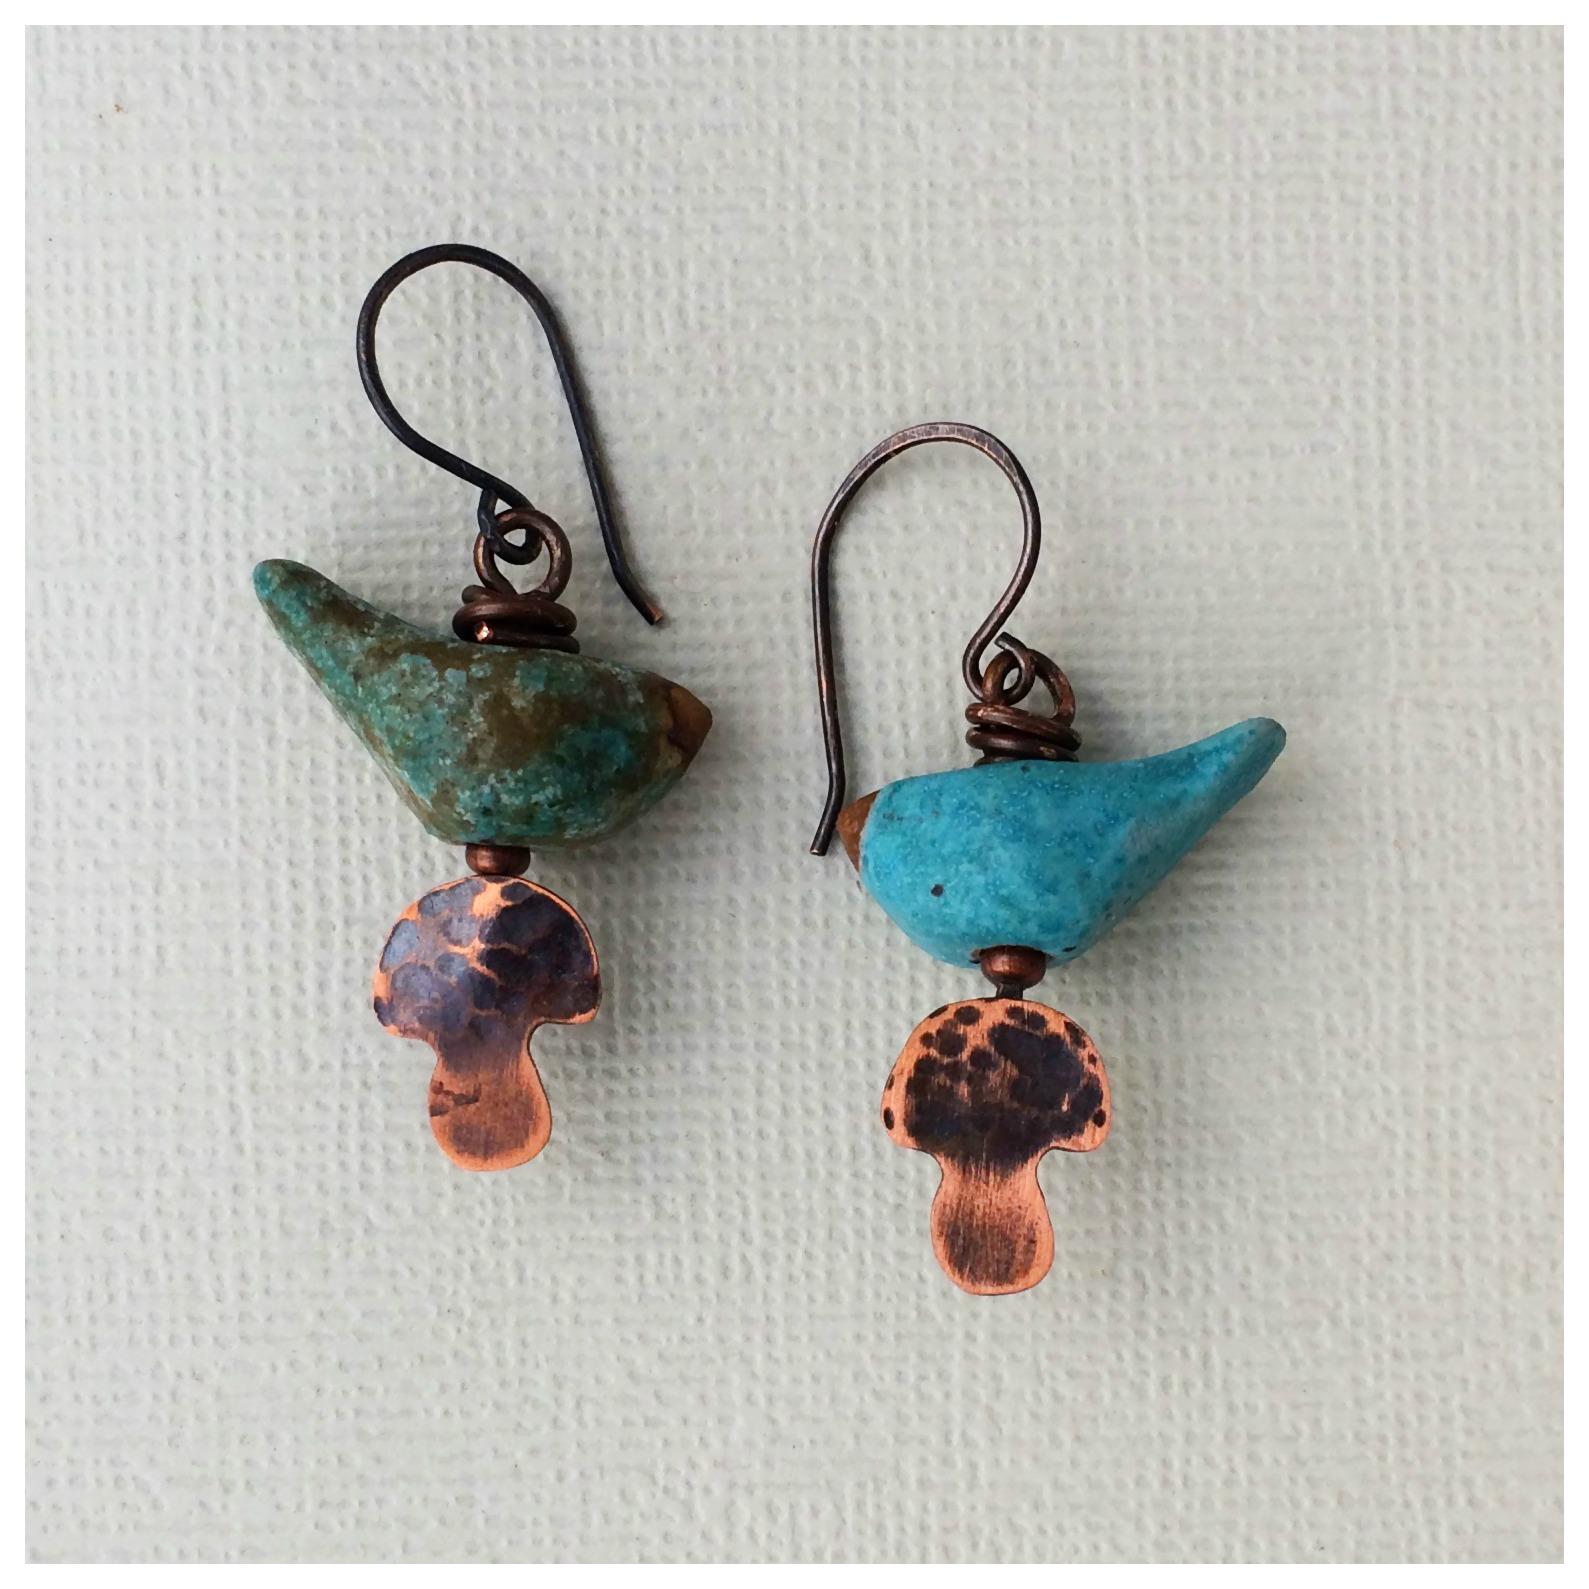 Shroombirds earrings